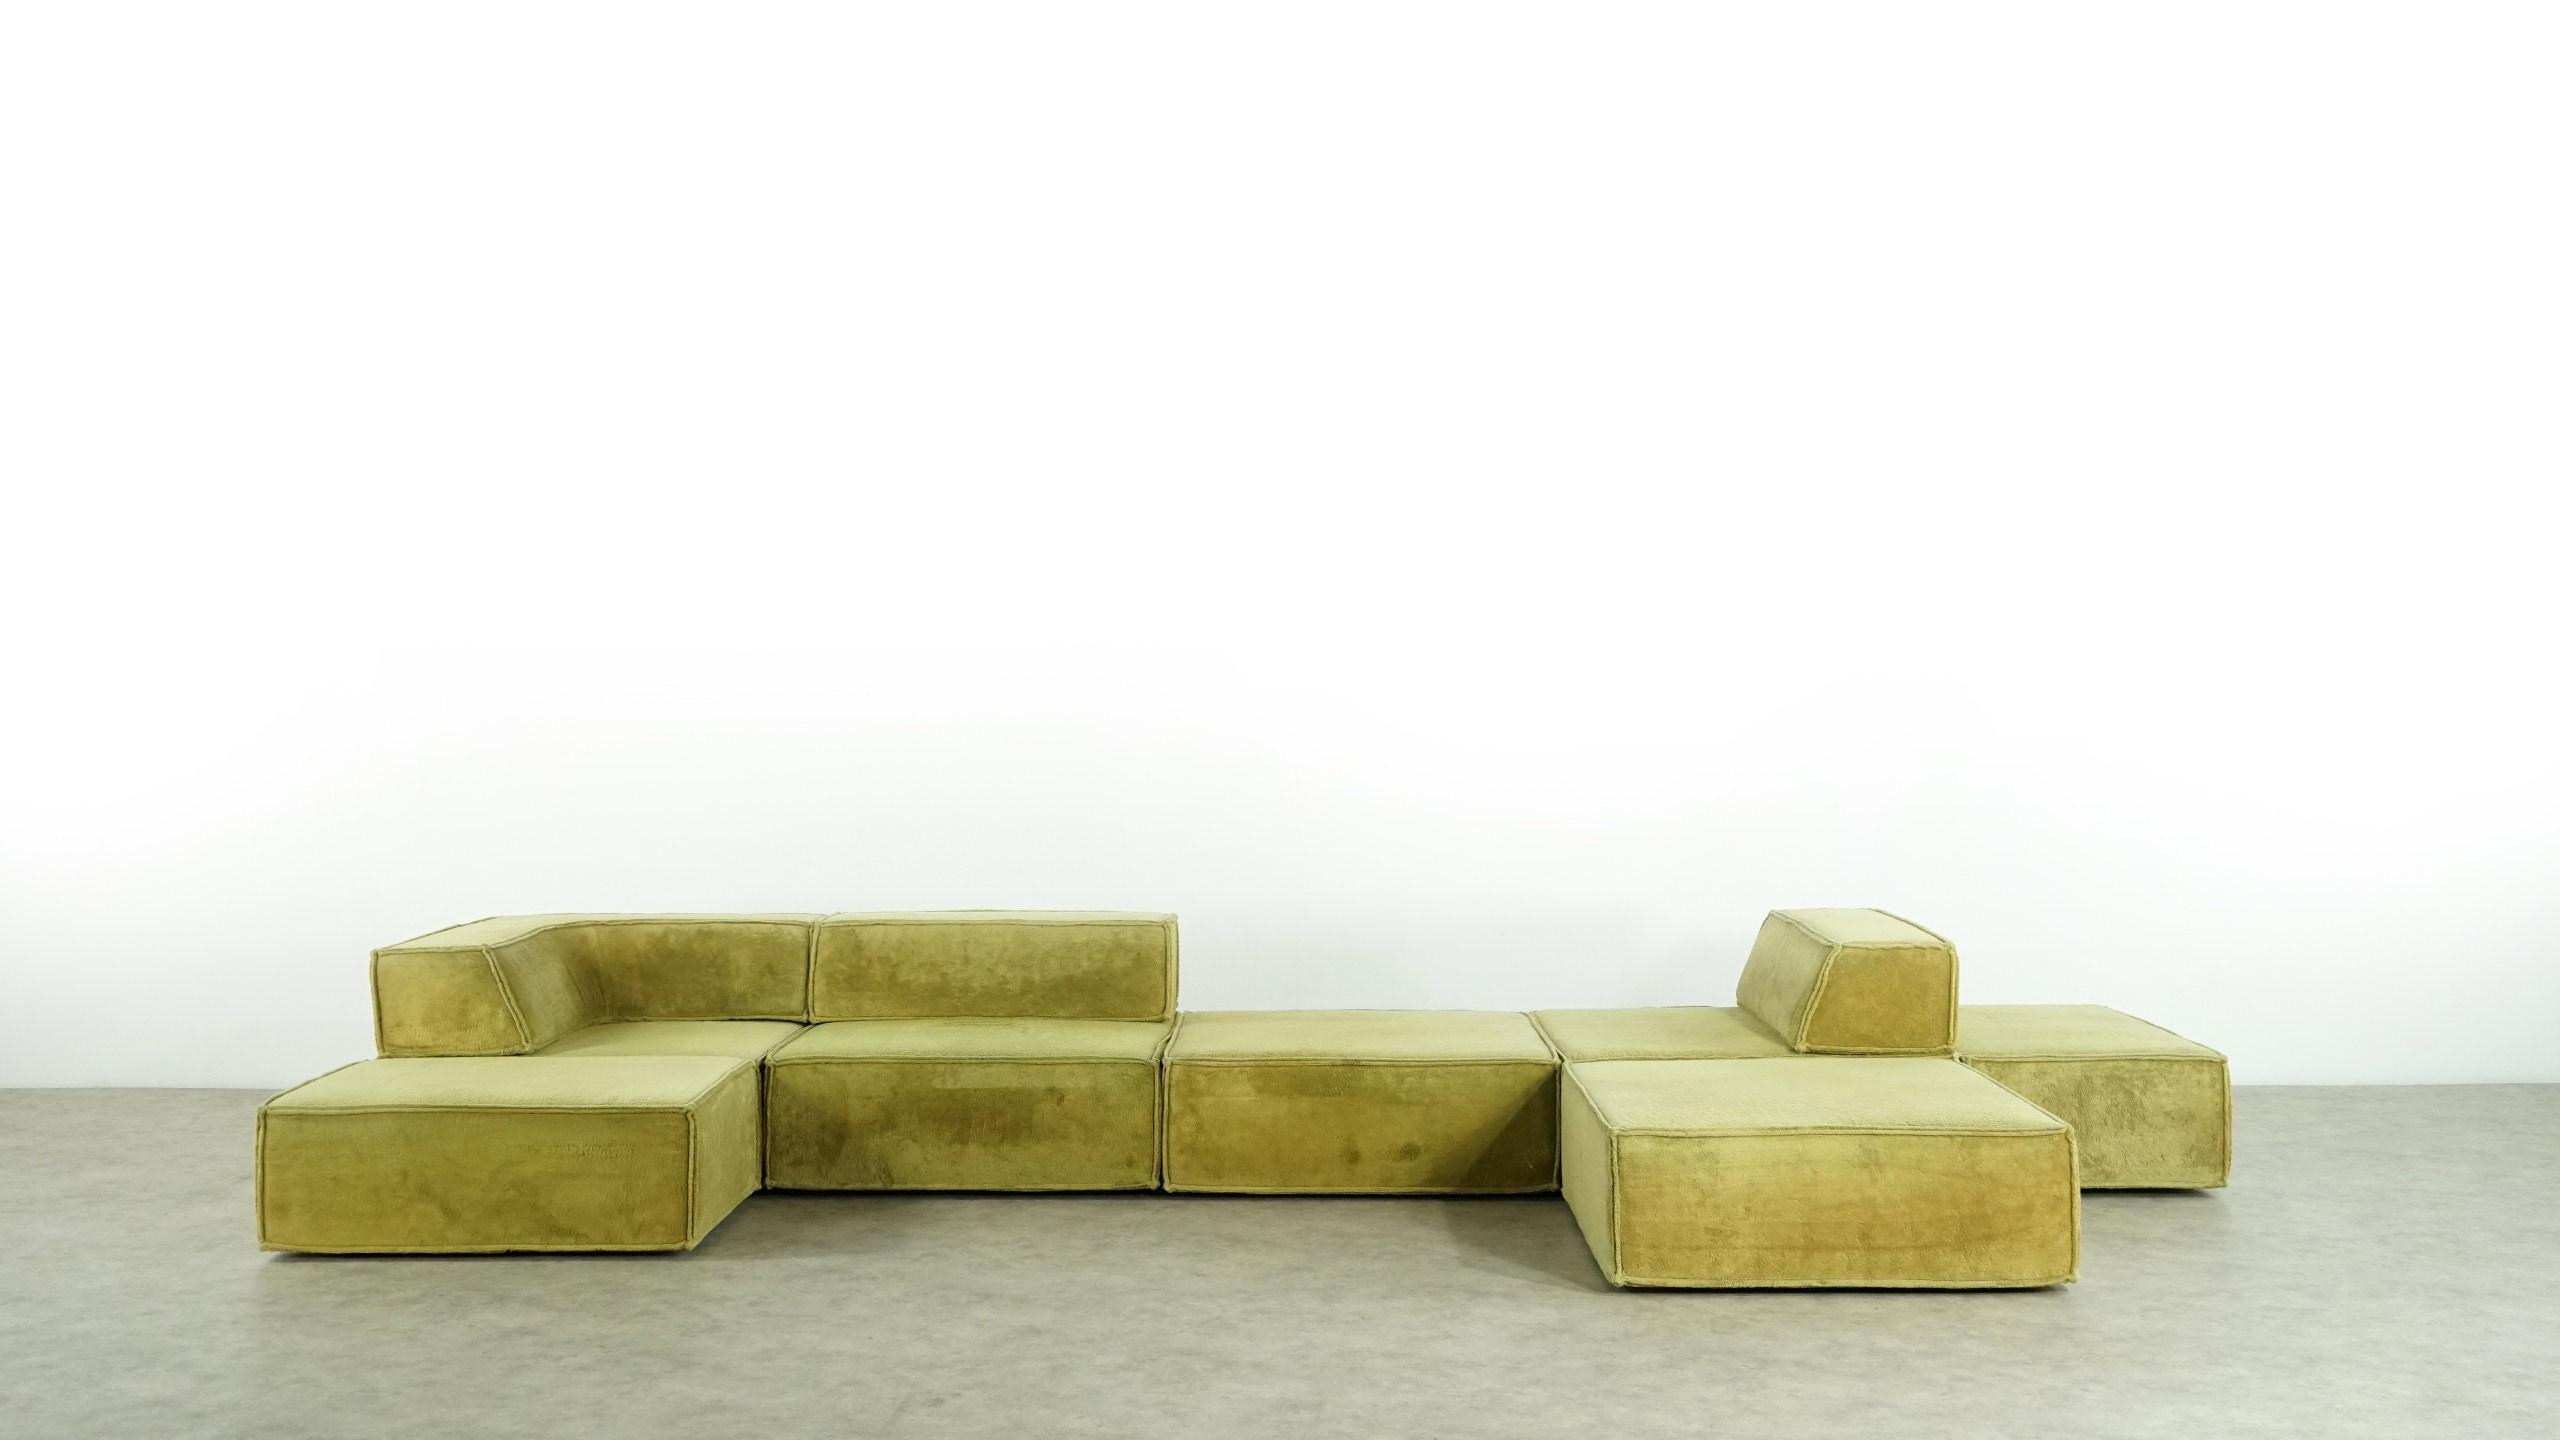 cor trio sofa by team form ag zorrobot. Black Bedroom Furniture Sets. Home Design Ideas